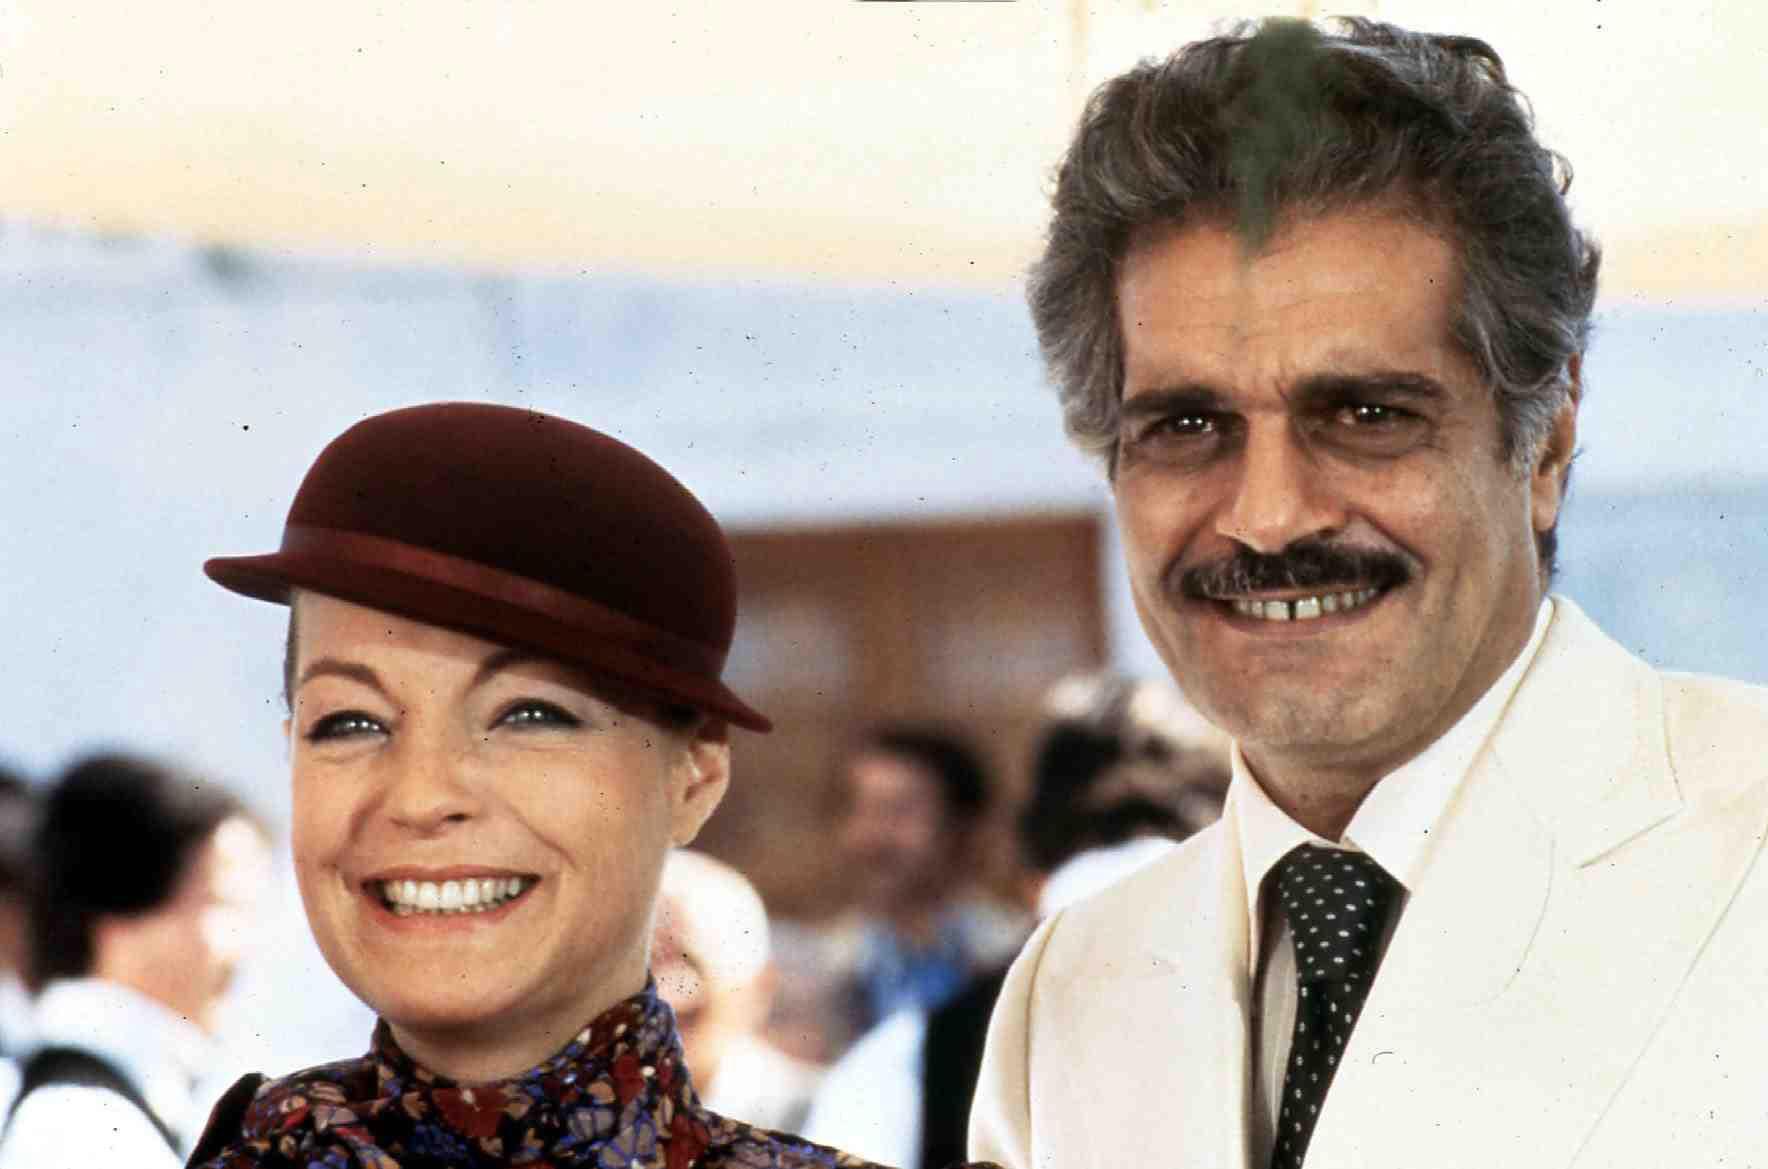 Sidney Sheldon's Bloodline  (1978) Helene Martin (Romy Schneider), Ivo Palazzi (Omar Sharif) Regie: Terence Young ,